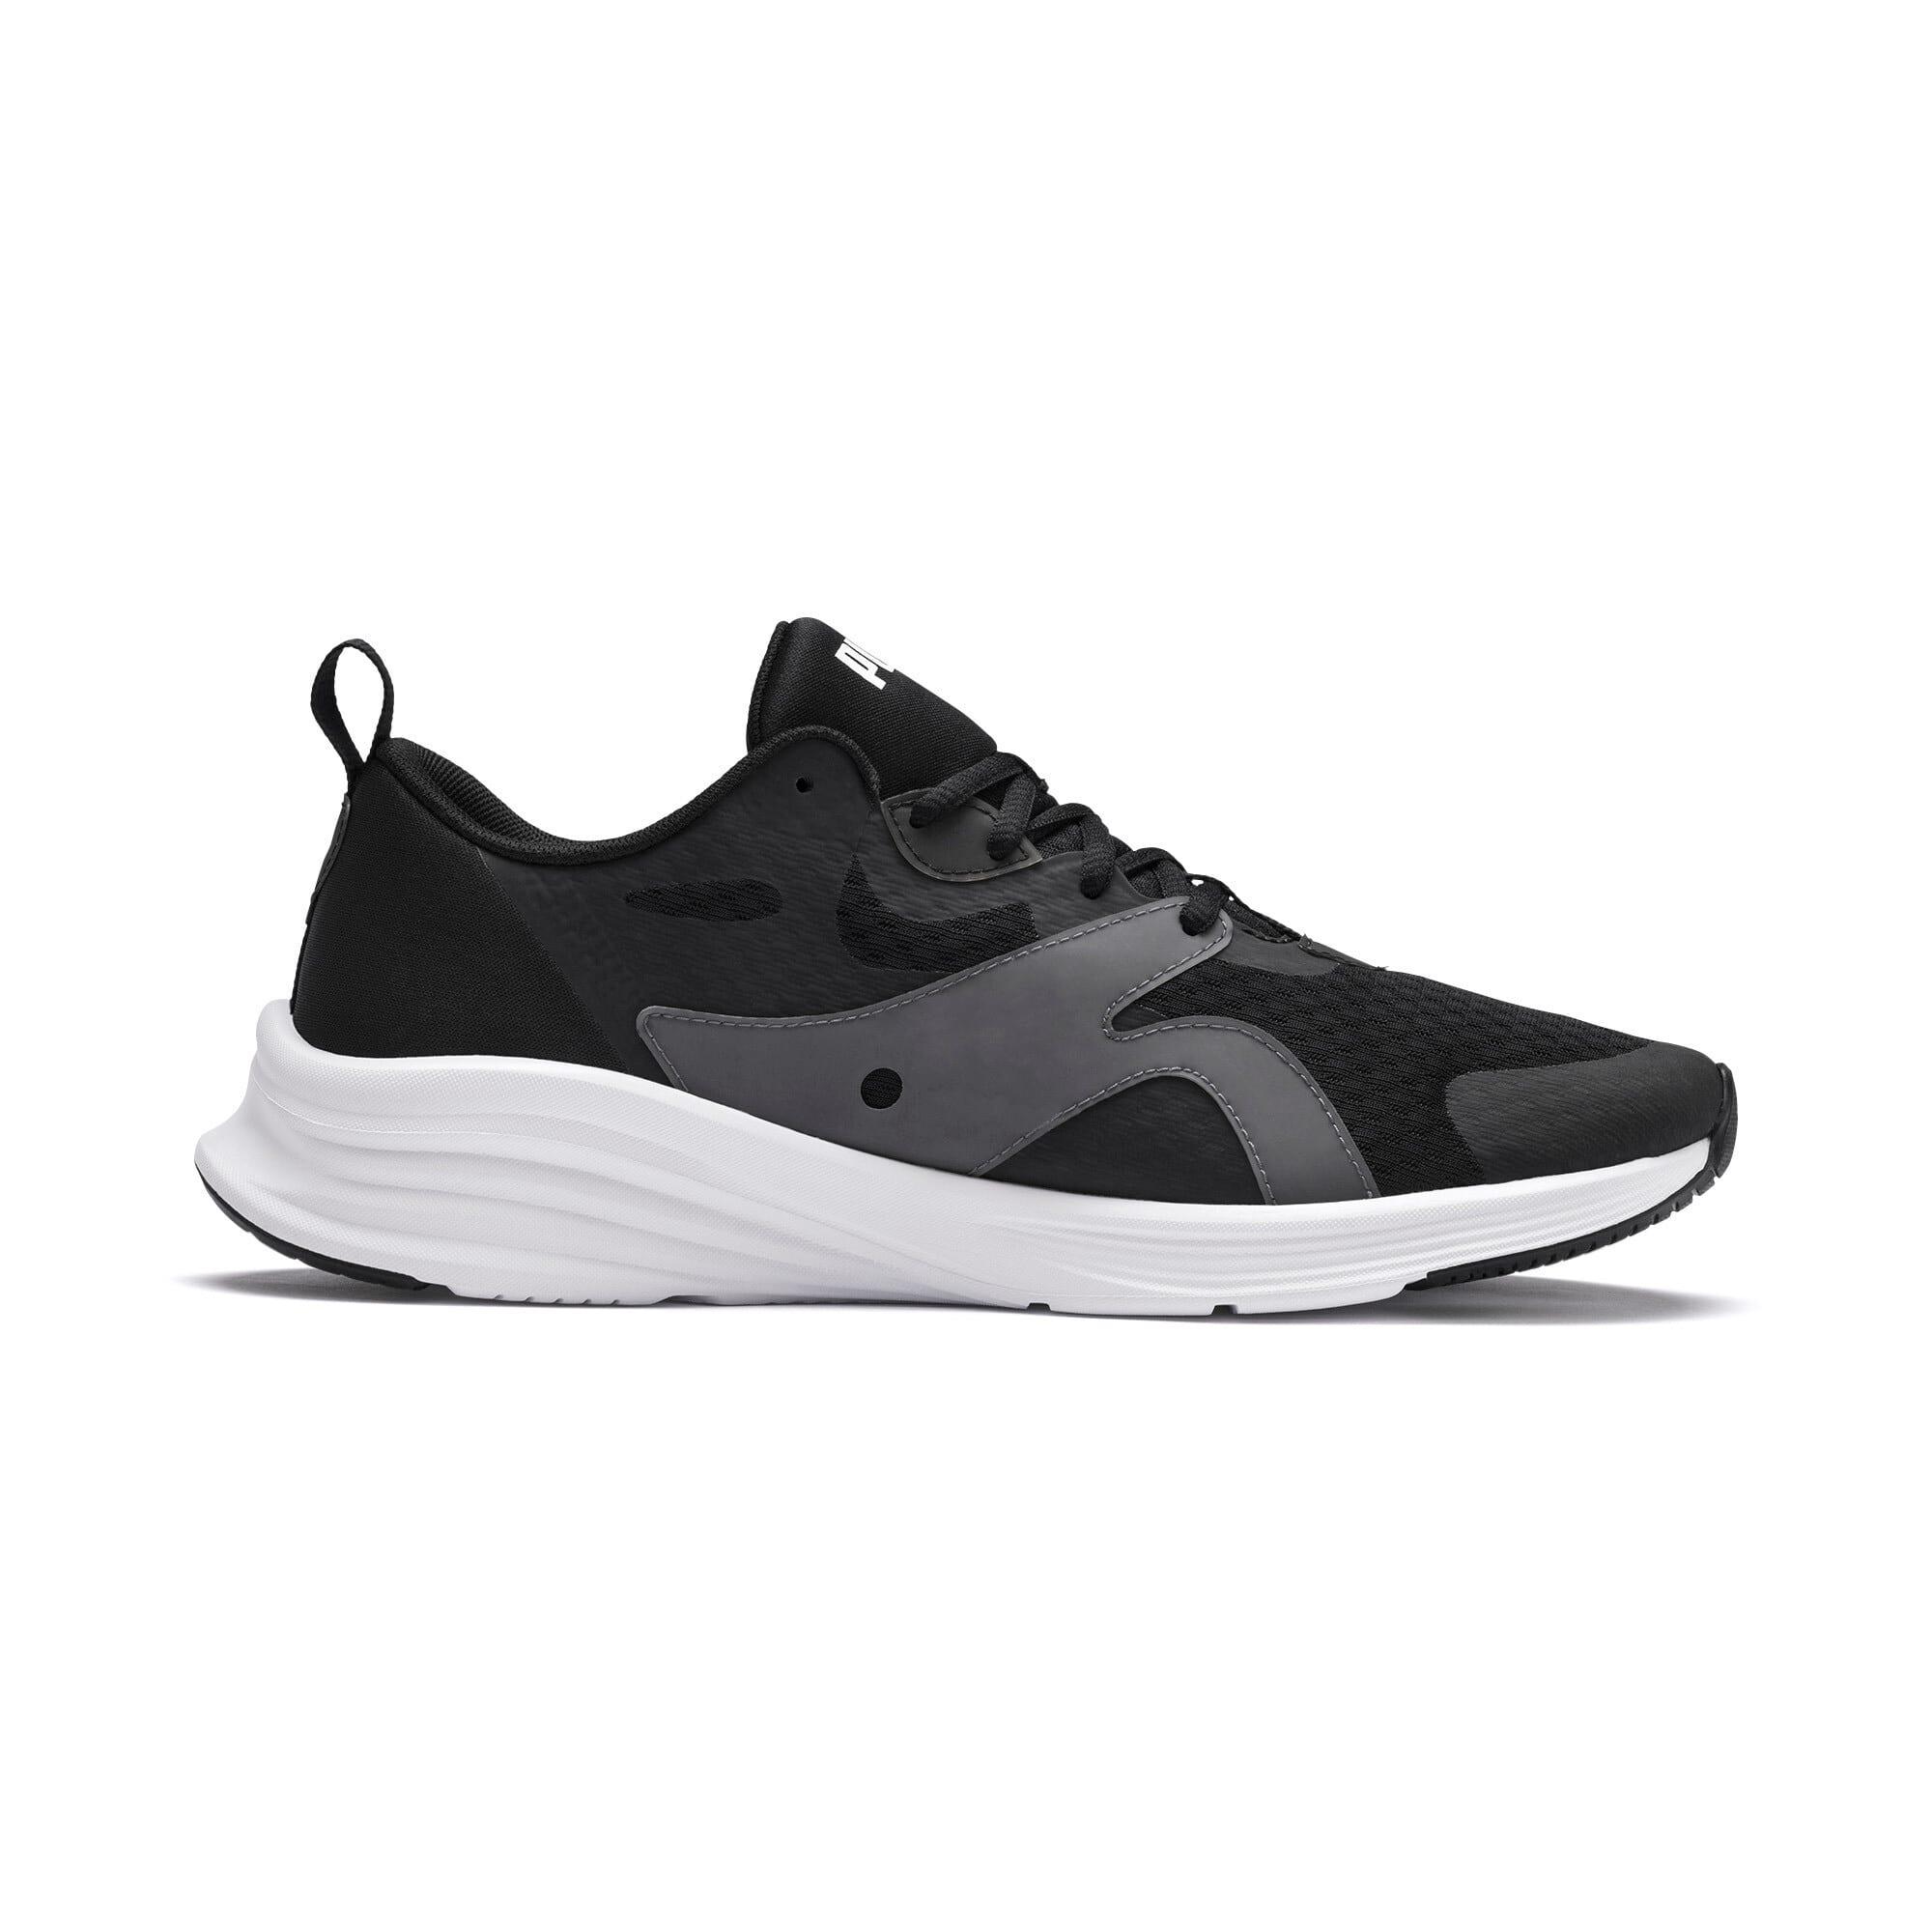 Thumbnail 6 of HYBRID Fuego Men's Running Shoes, Puma Black-Puma White, medium